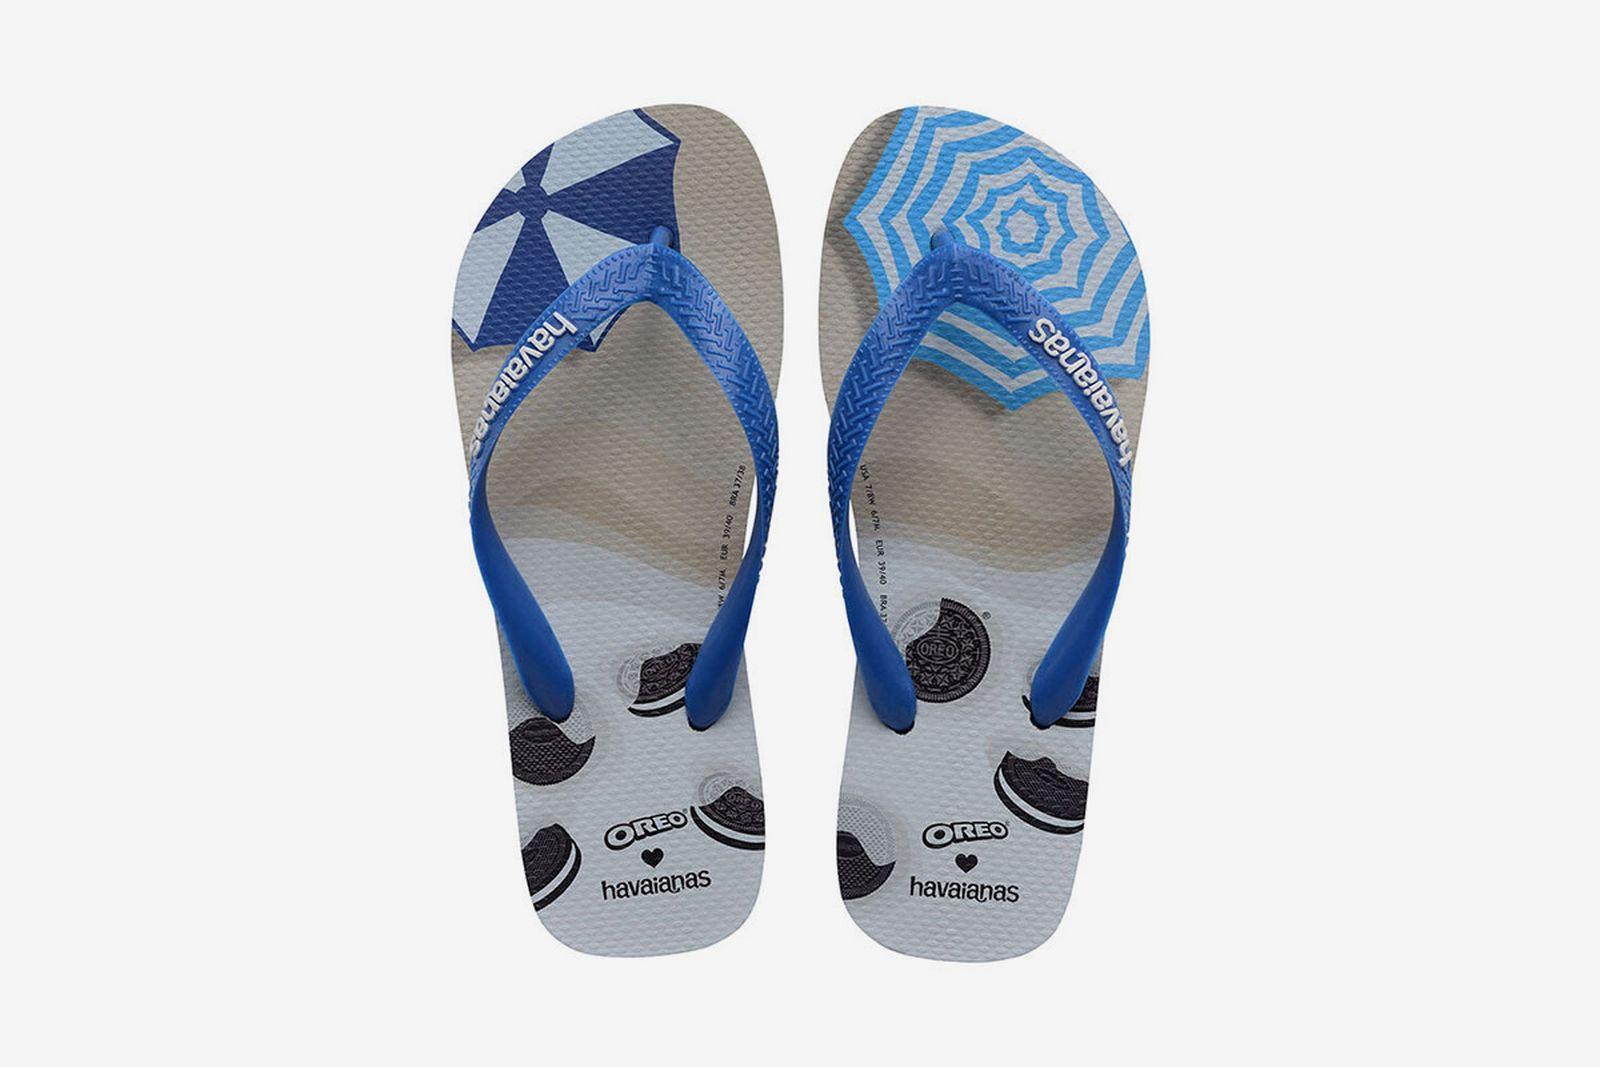 oreo-havaianas-flip-flops-02